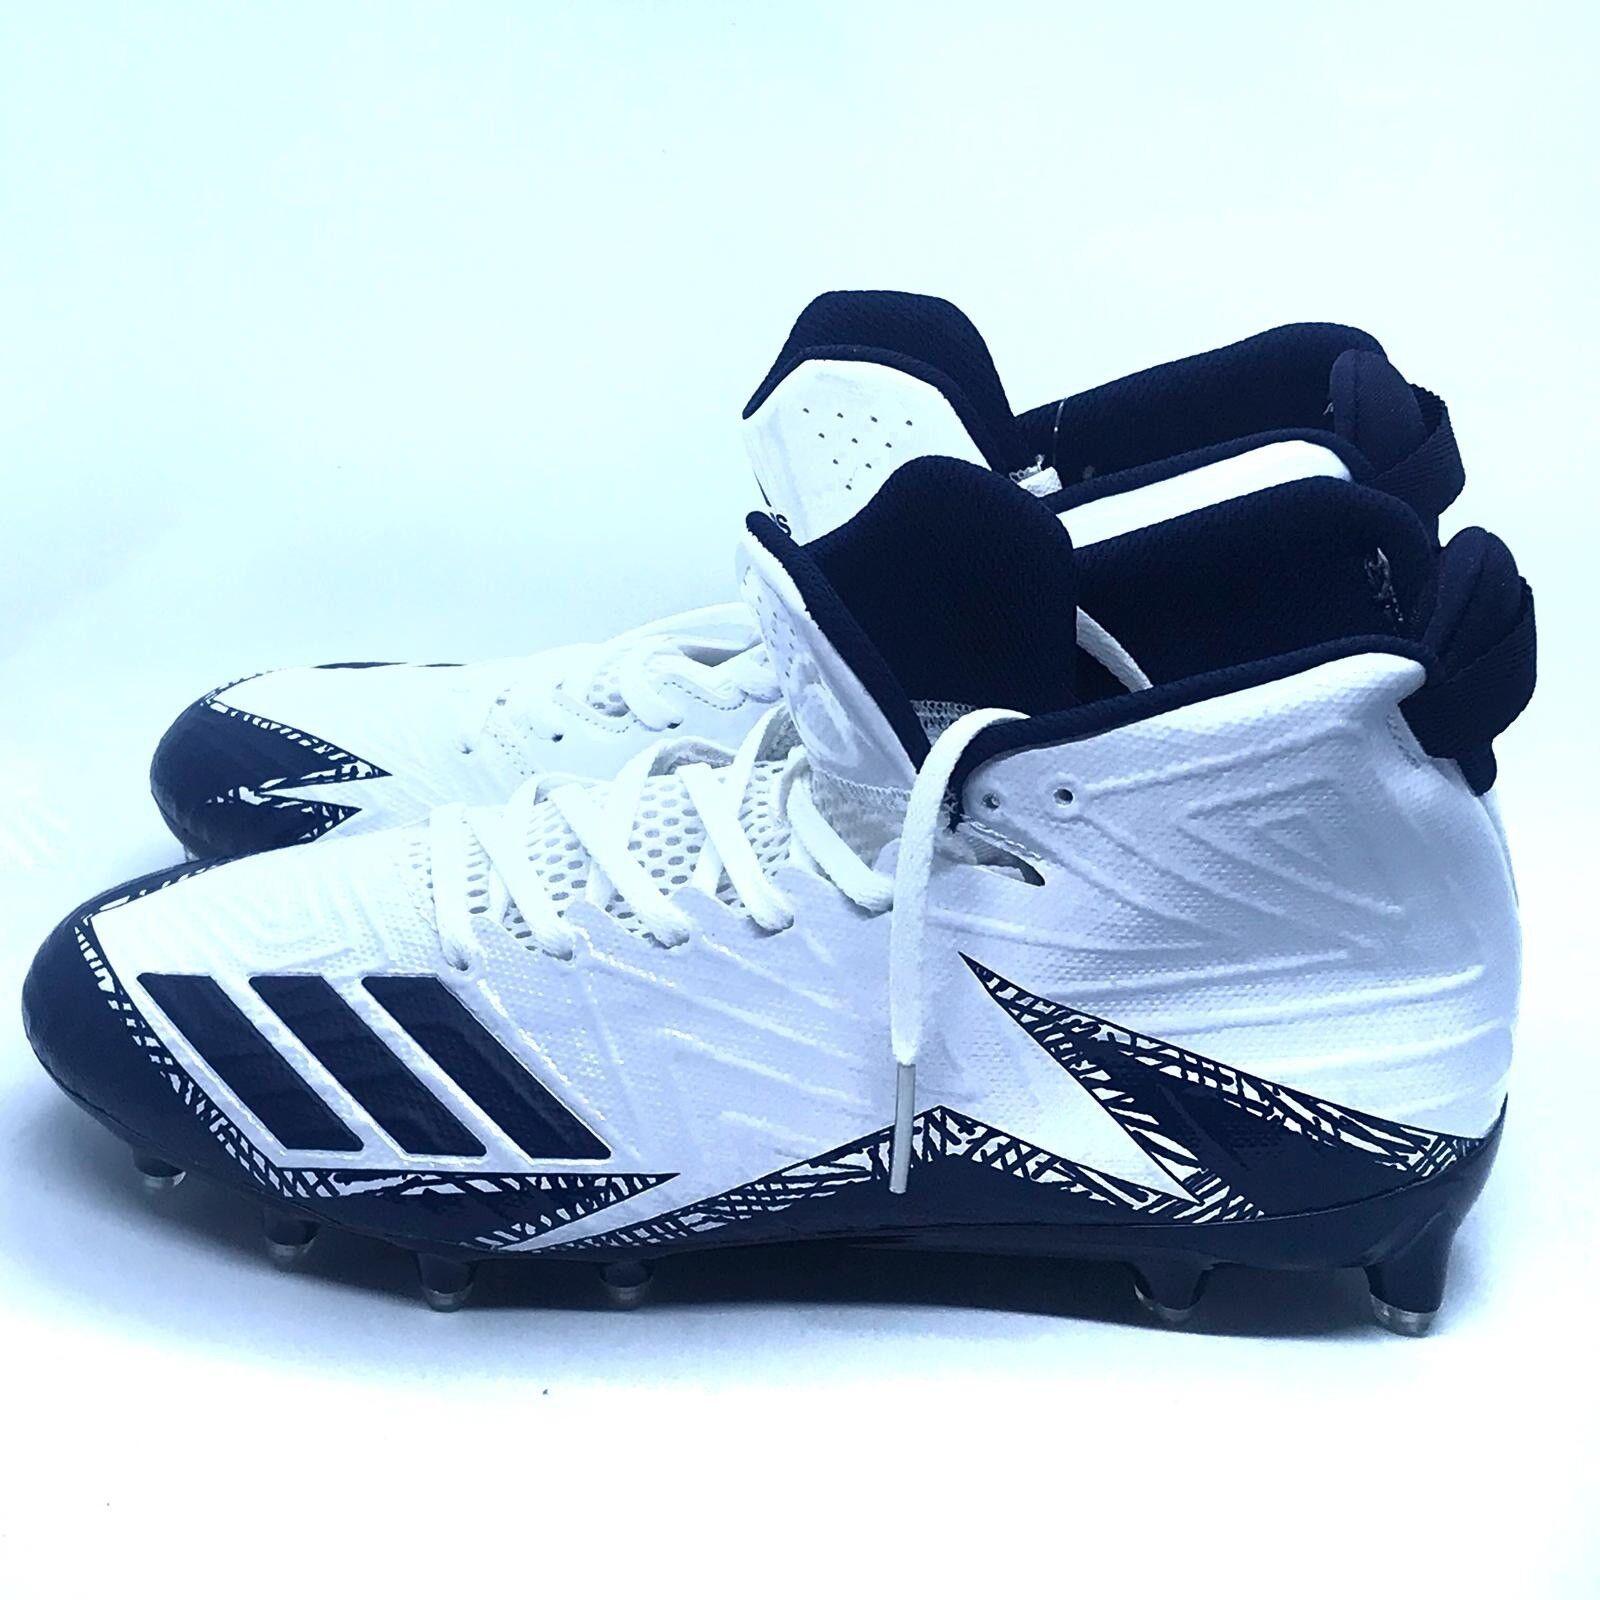 NEW Adidas Men's SM Freak X Carbon Mid Football Cleats Size 13 BW1500